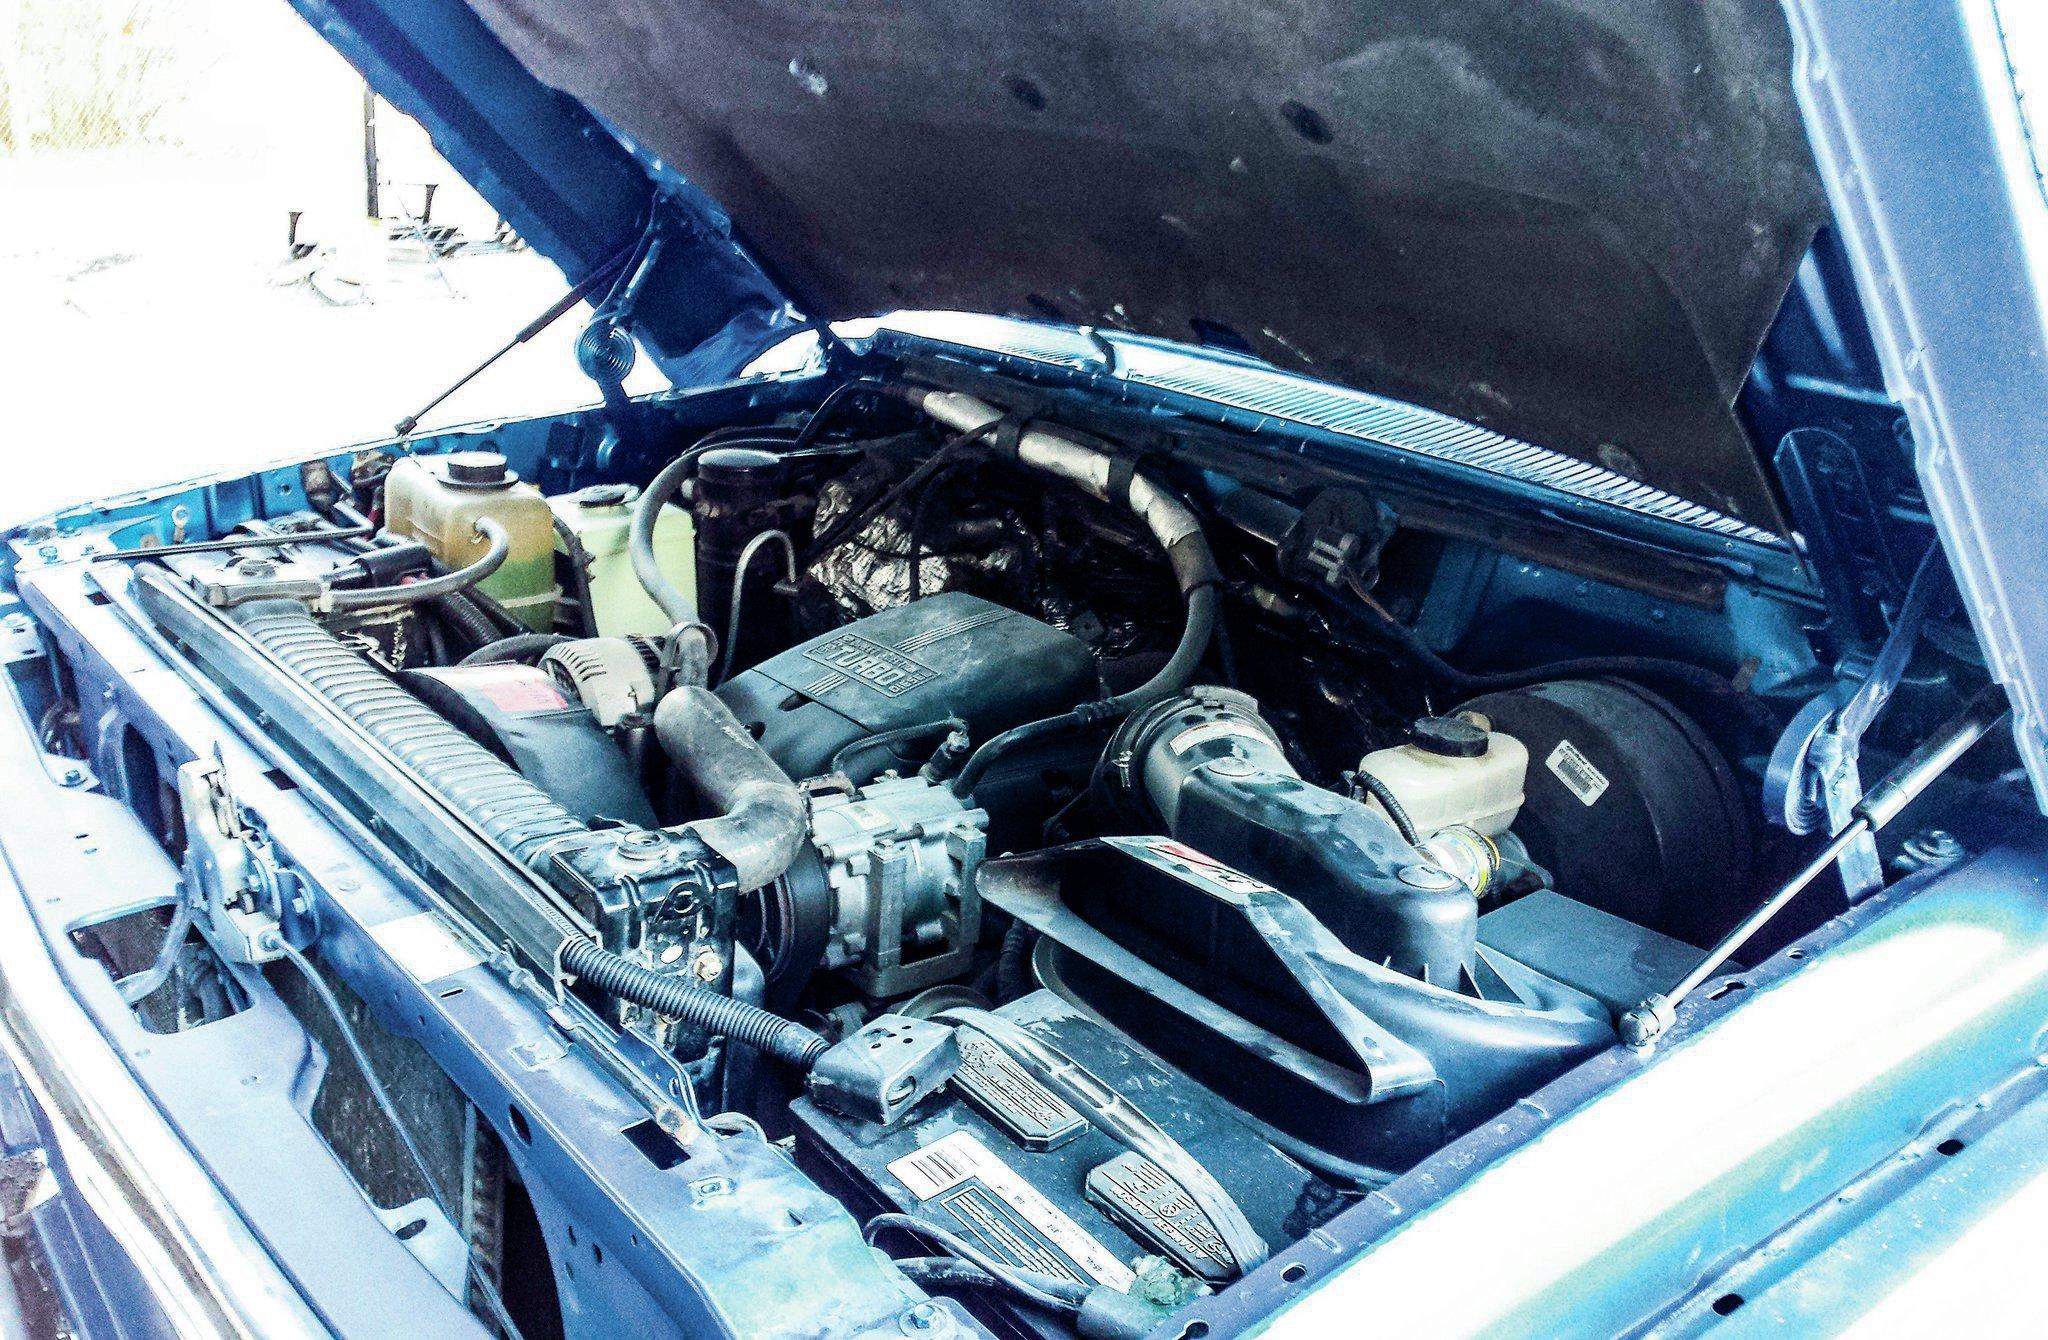 Fuel Pump 95 73 E350 Ford Powerstroke Diesel Forum